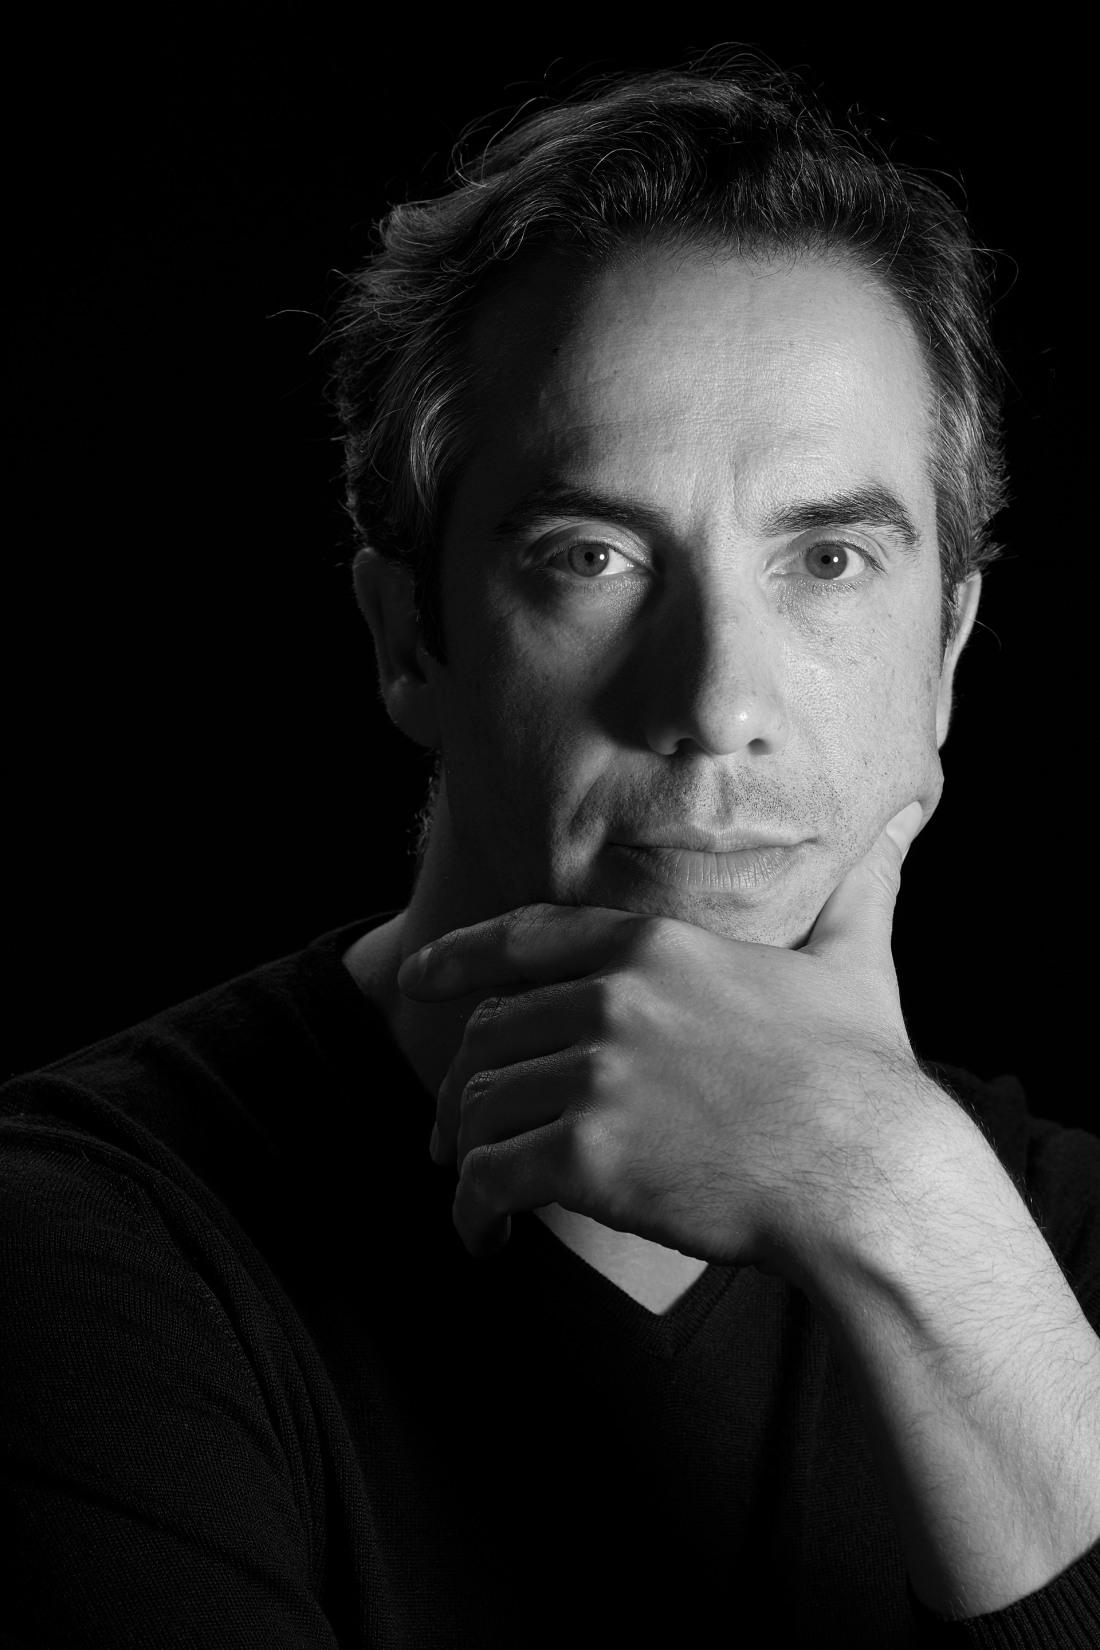 1_Retrato de José Rosinhas, fotografia de Filipe Braga_José_Rosinhas_junho_2018